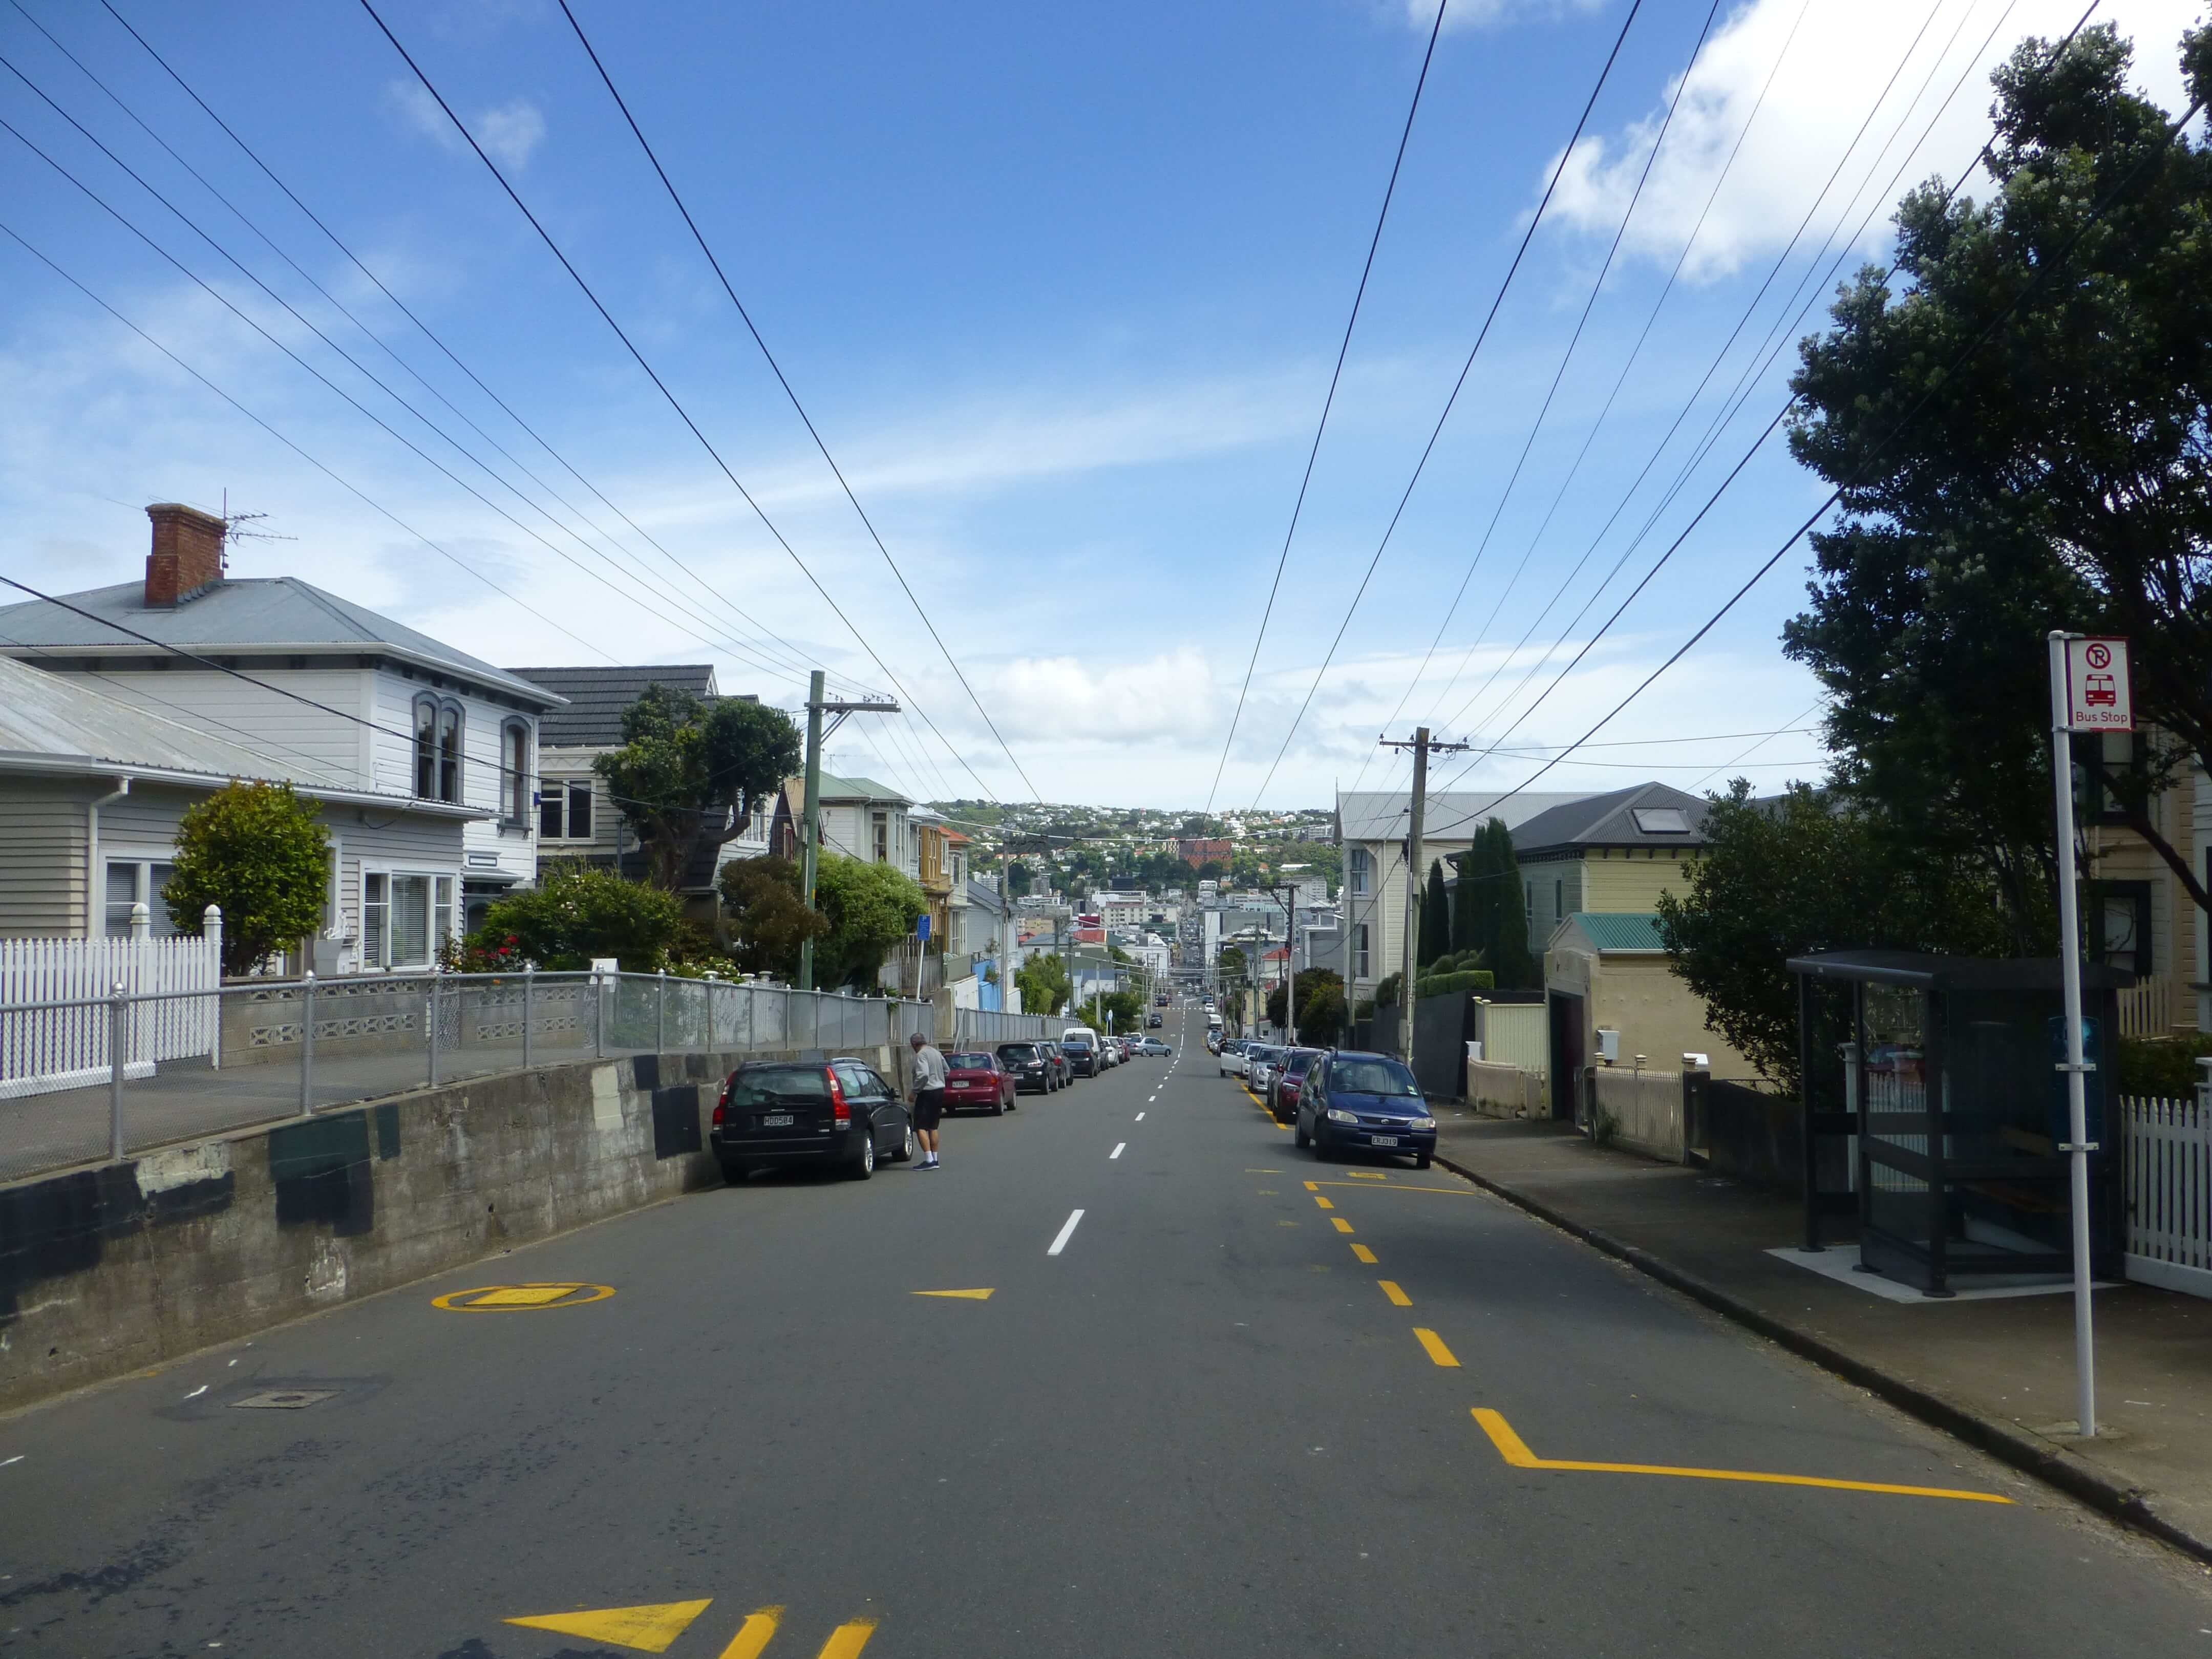 in Wellington, Neuseeland, Weit-weg.reisen 14